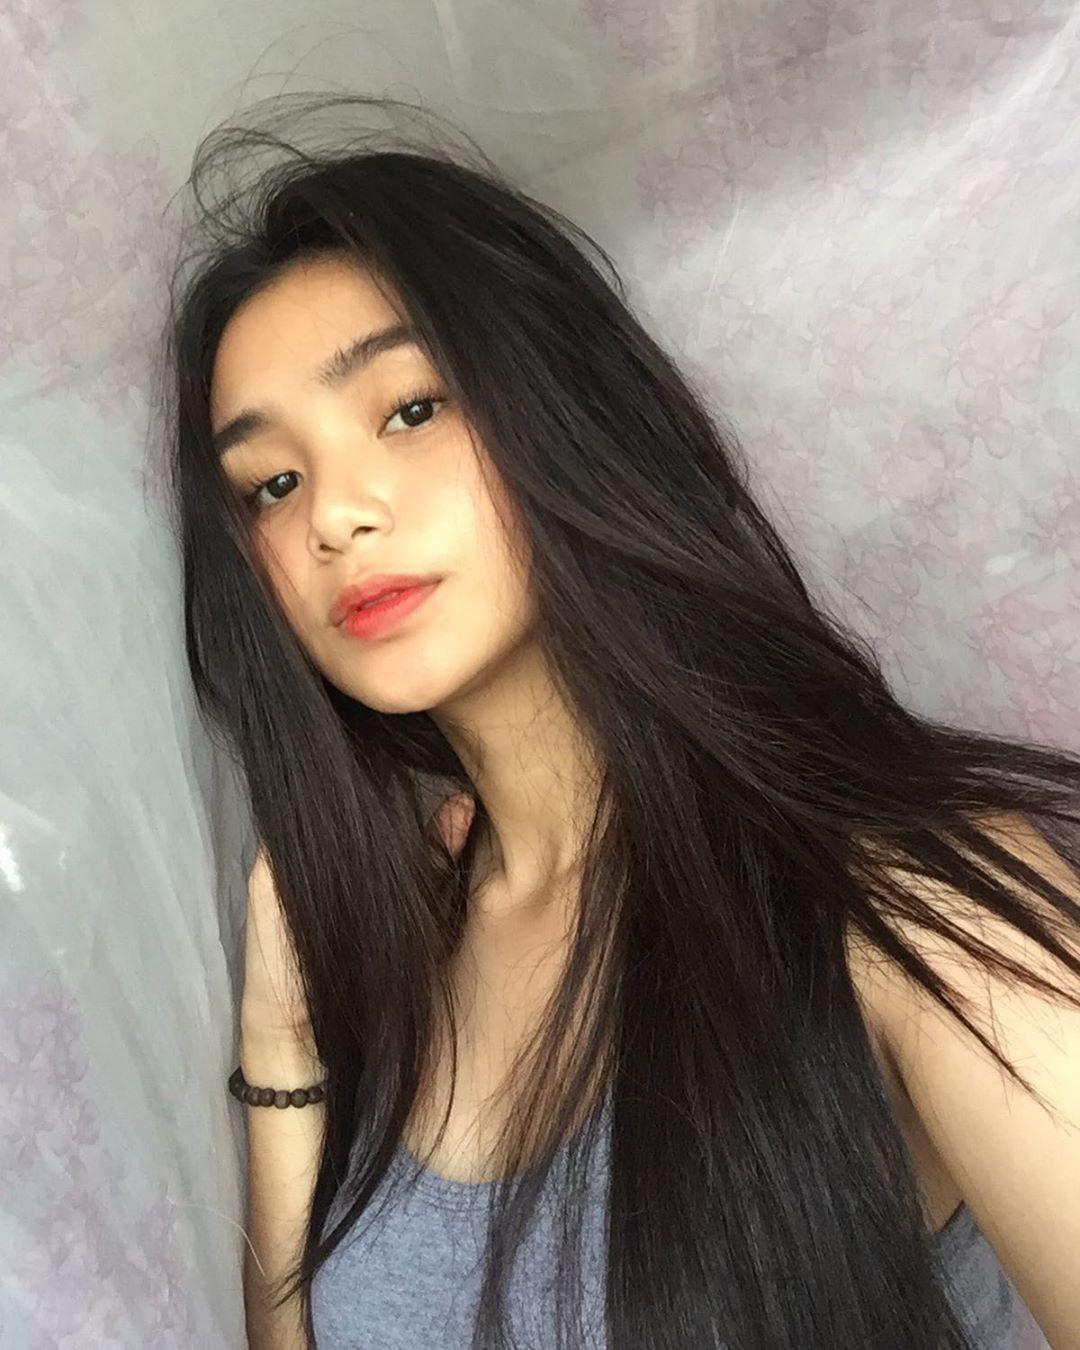 Girls filipina Filipina Dating,